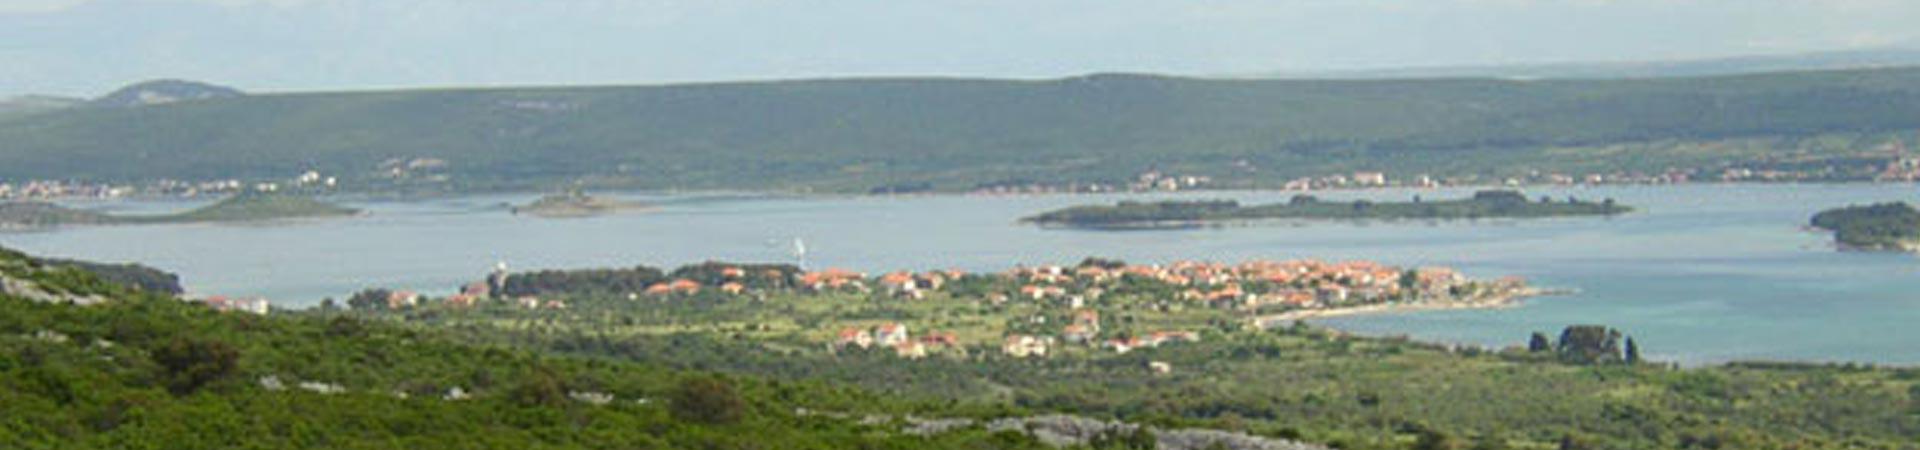 Pasman, Croatia